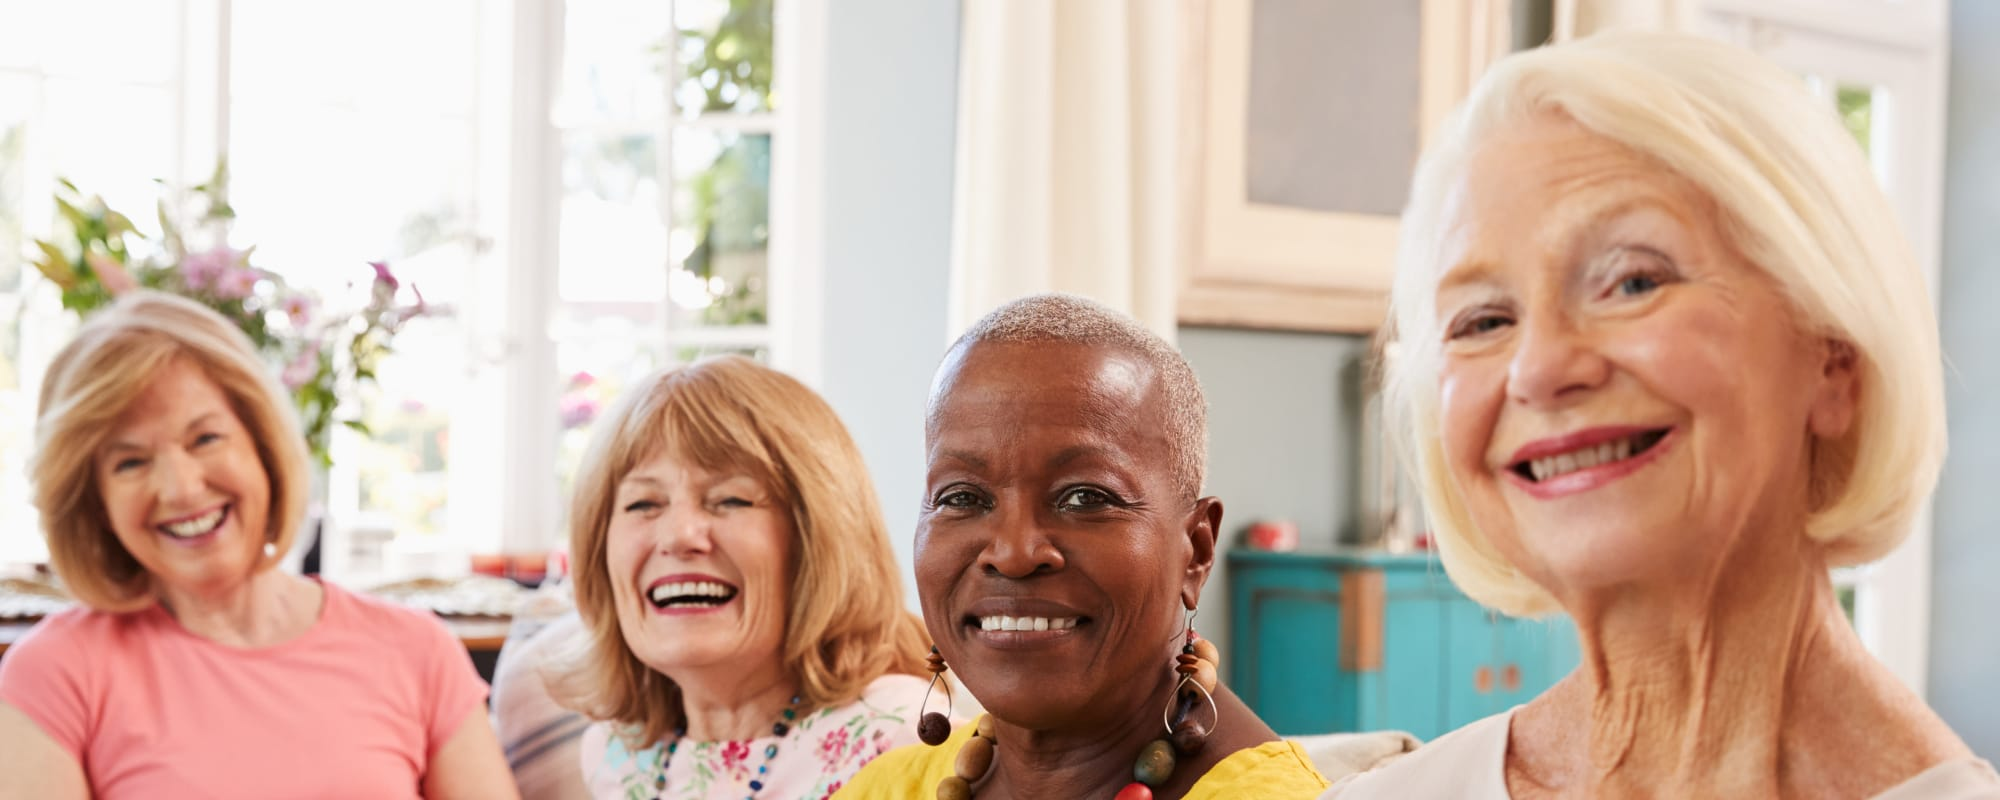 Lifestyle options in Valparaiso Indiana for seniors